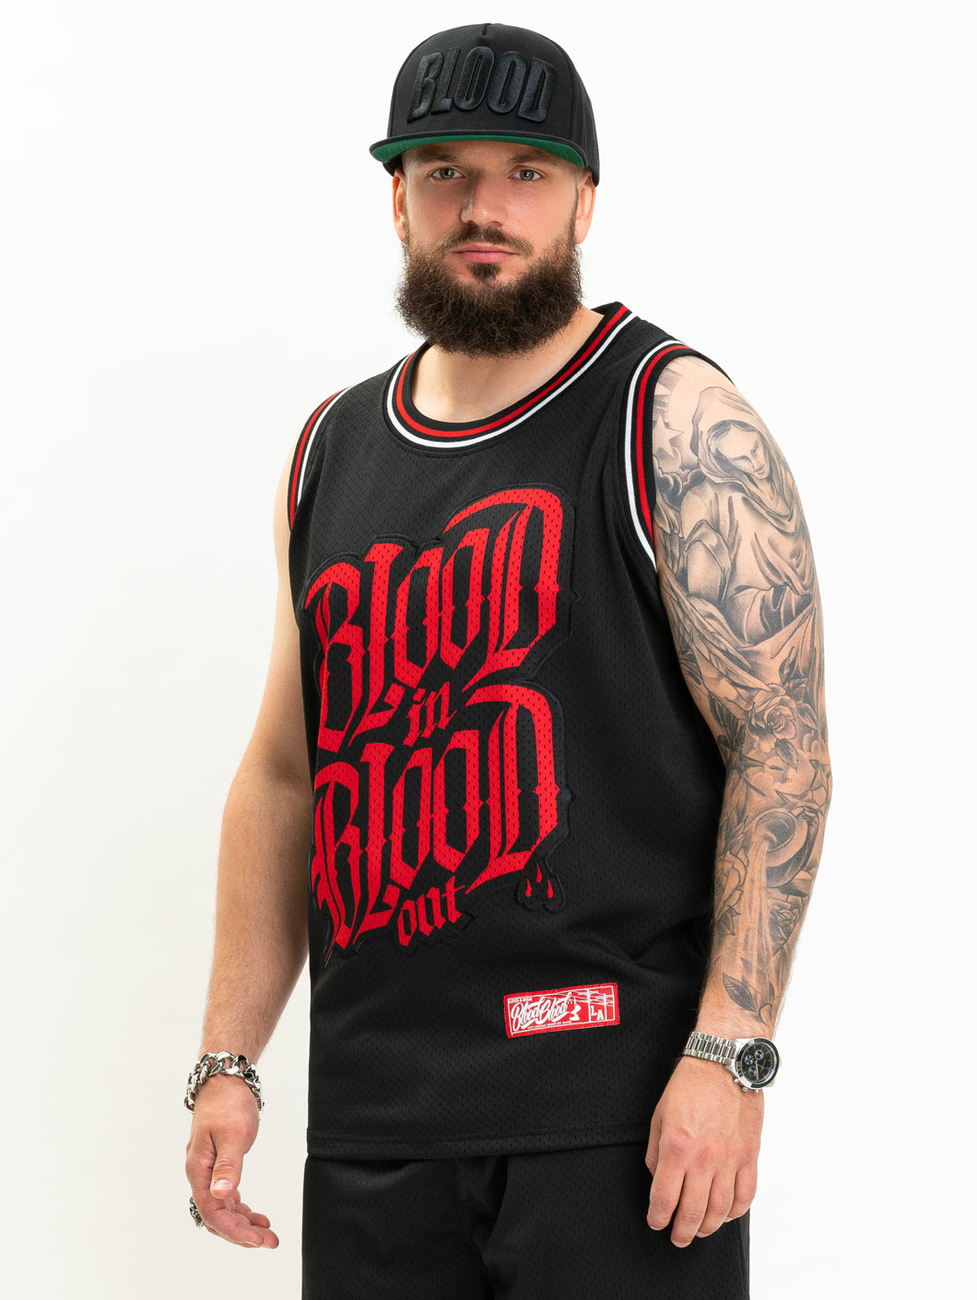 Blood In Blood Out Aguas Mesh Tanktop M